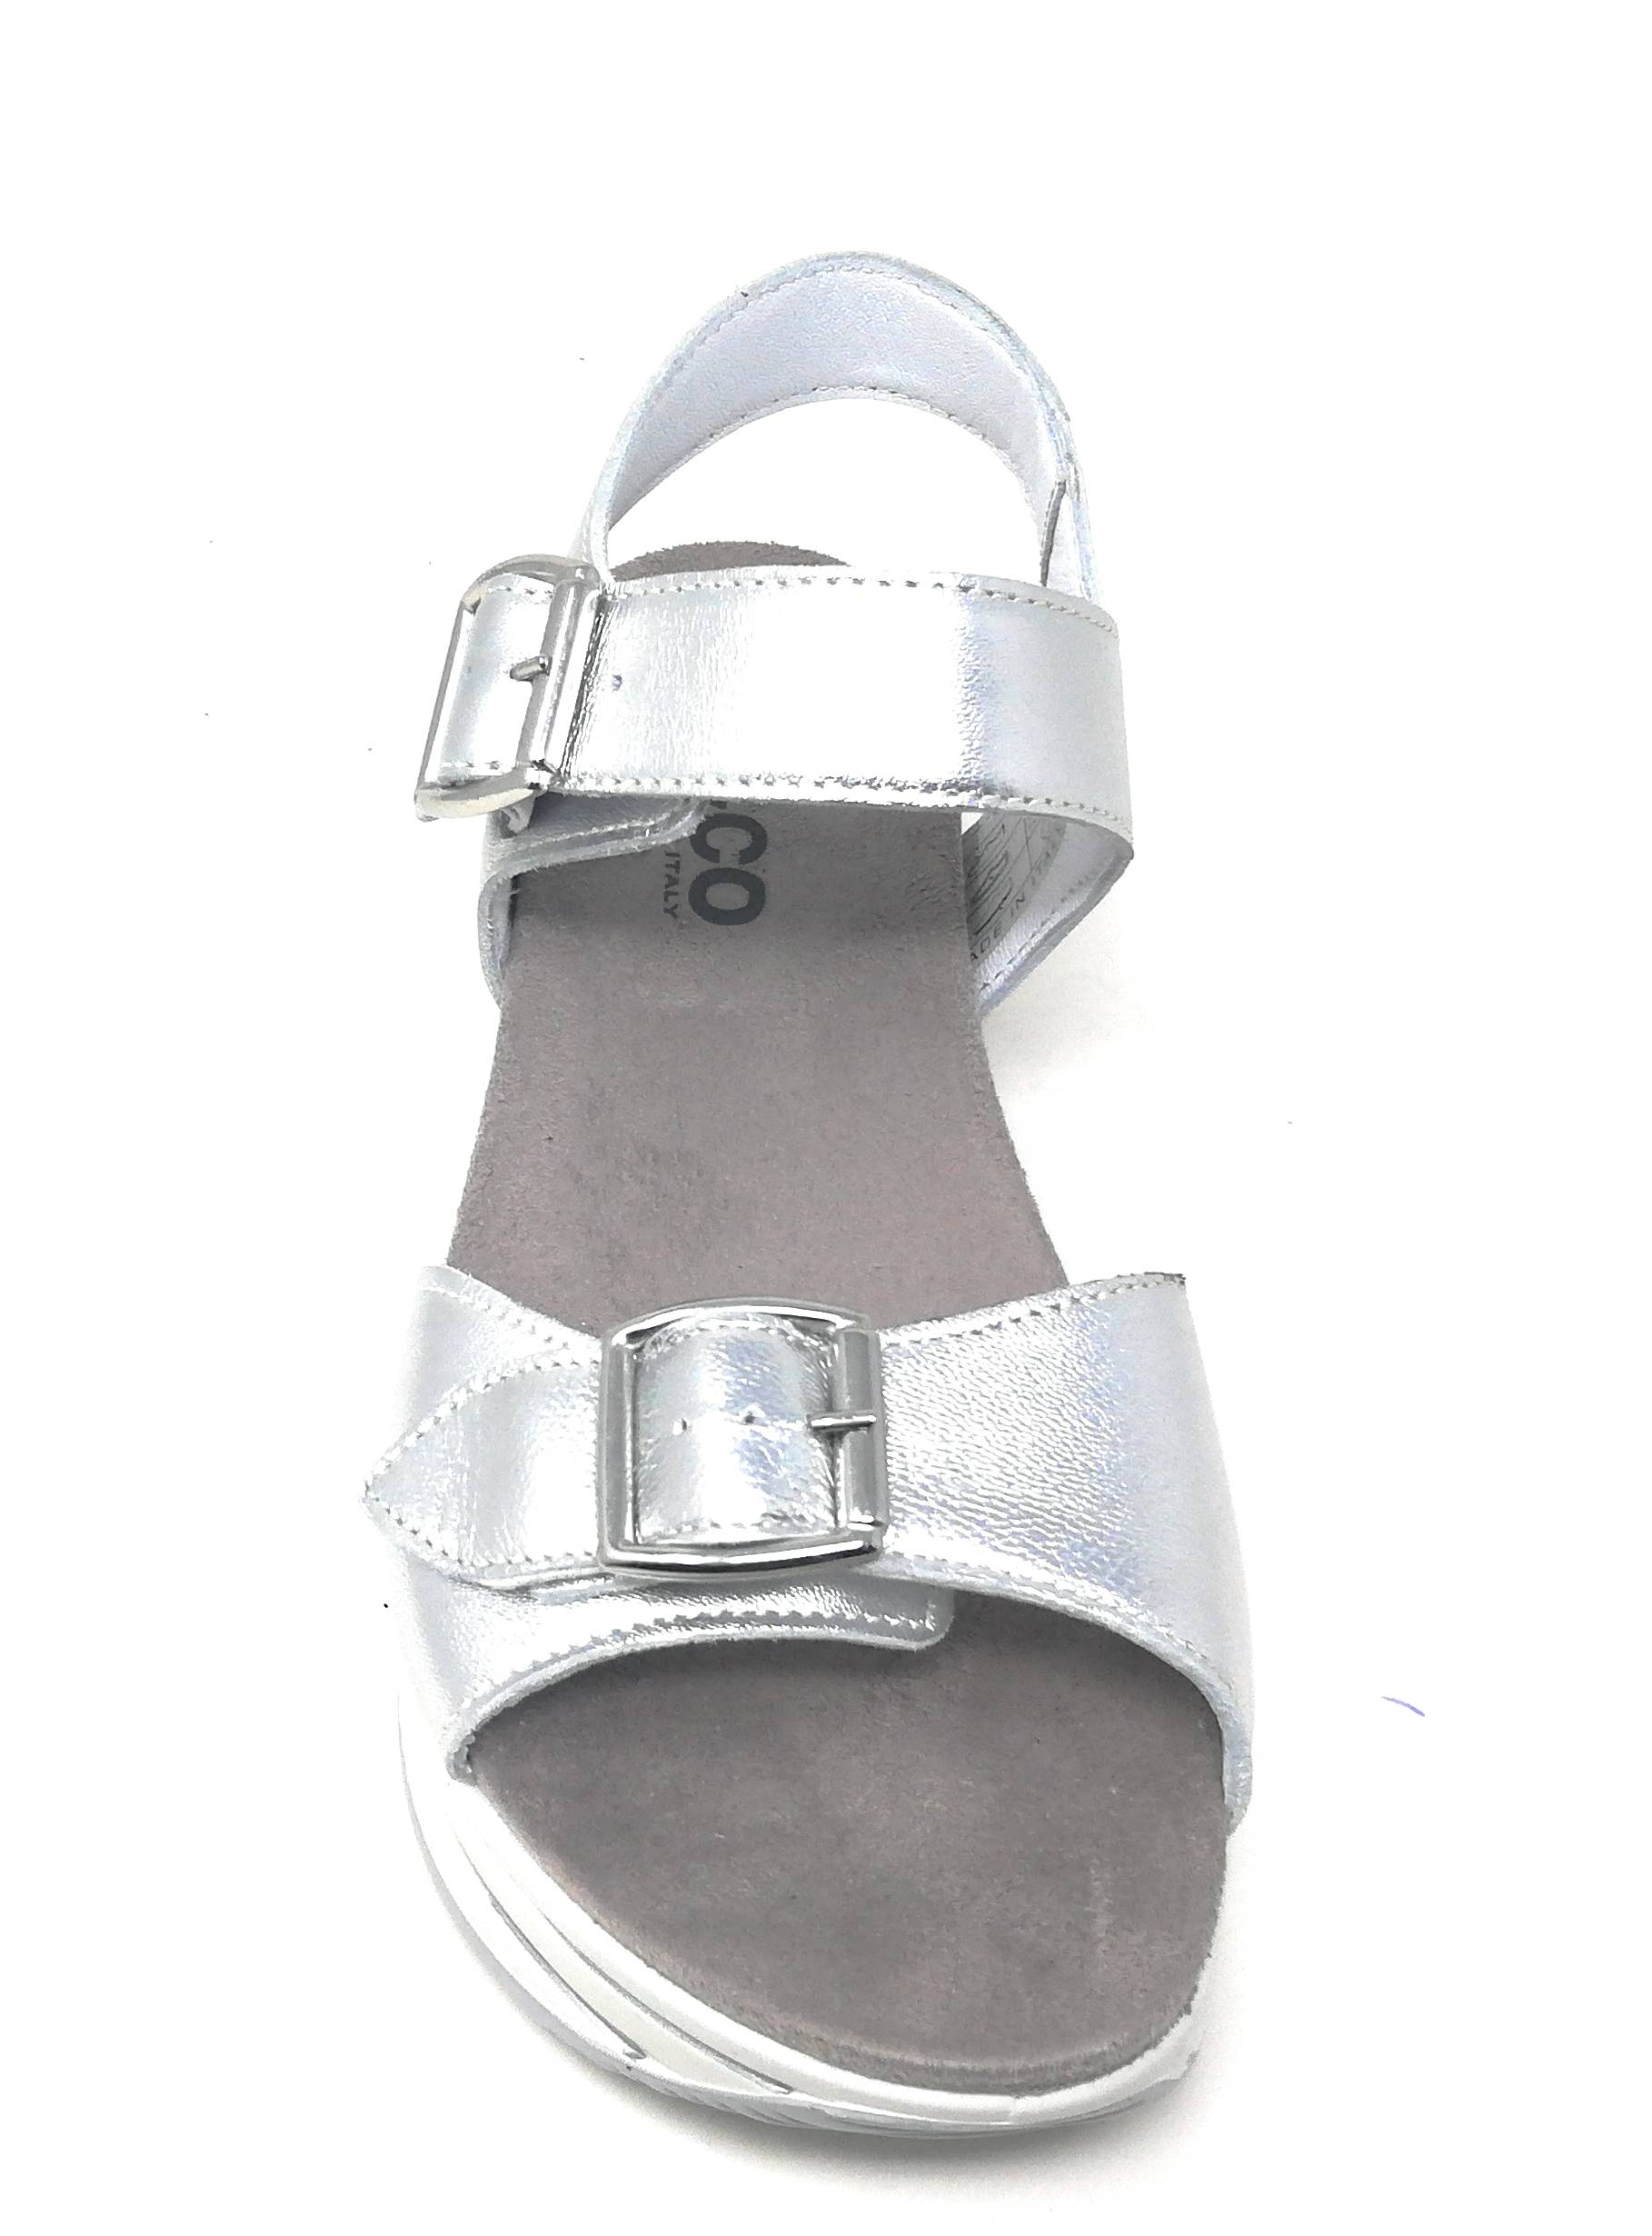 Sandalo da passeggio IGI&CO 3170766 3170766 3170766 Donna 87c034